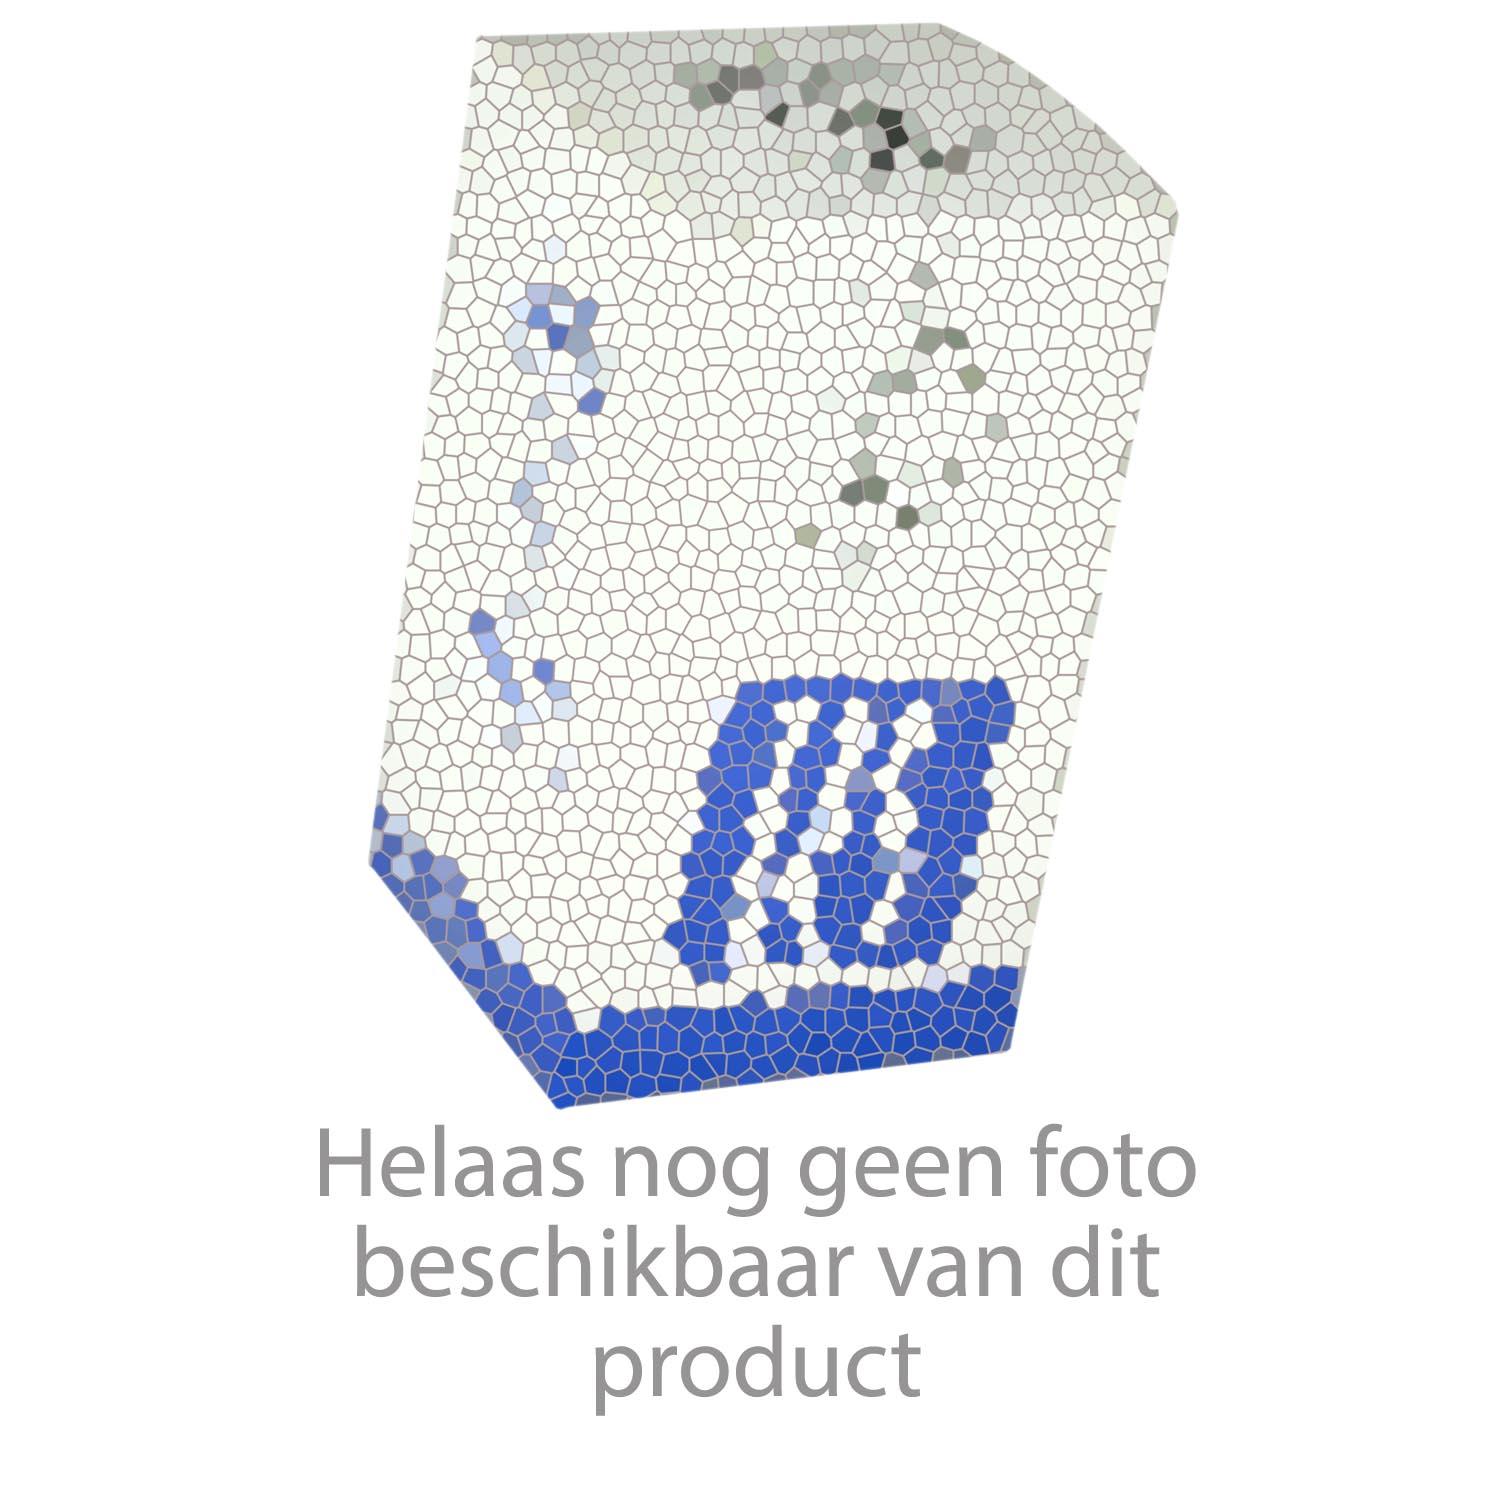 Grohe onderdelen Concetto Wastafelmengkraan Medium Gladde Body 23451001